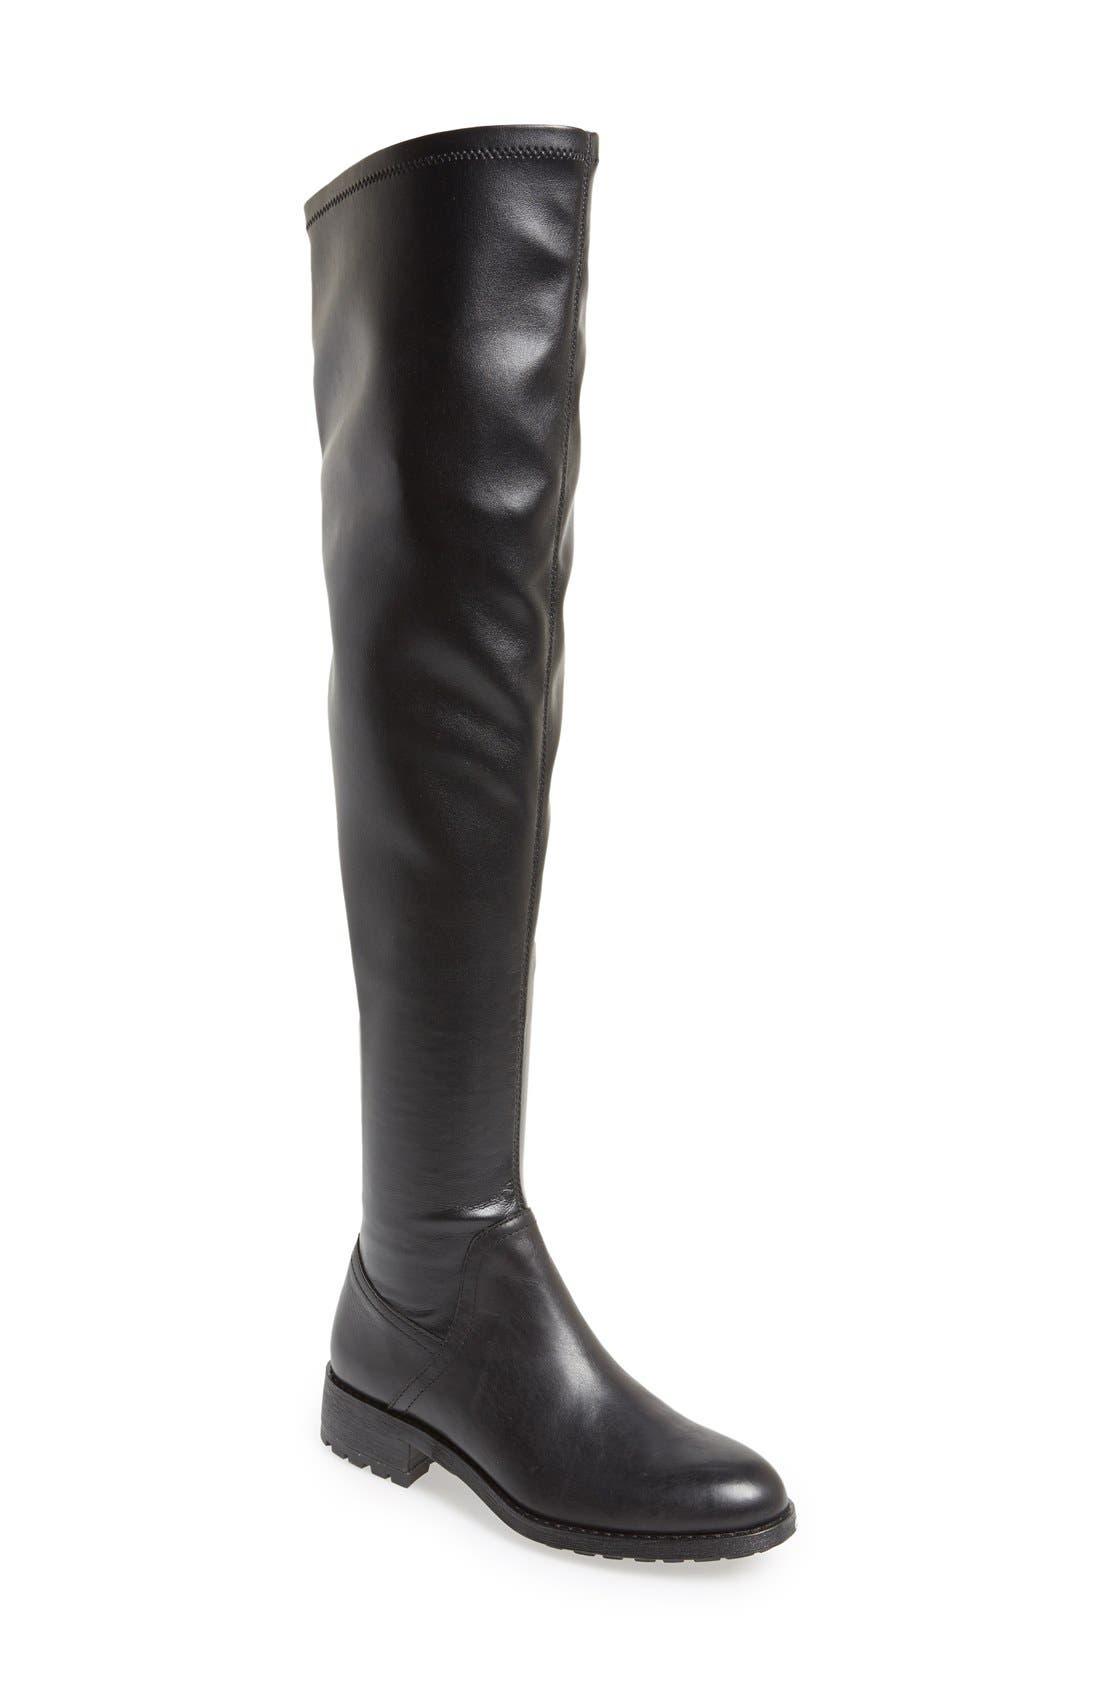 SAM EDELMAN 'Remi' Over The Knee Boot, Main, color, 001